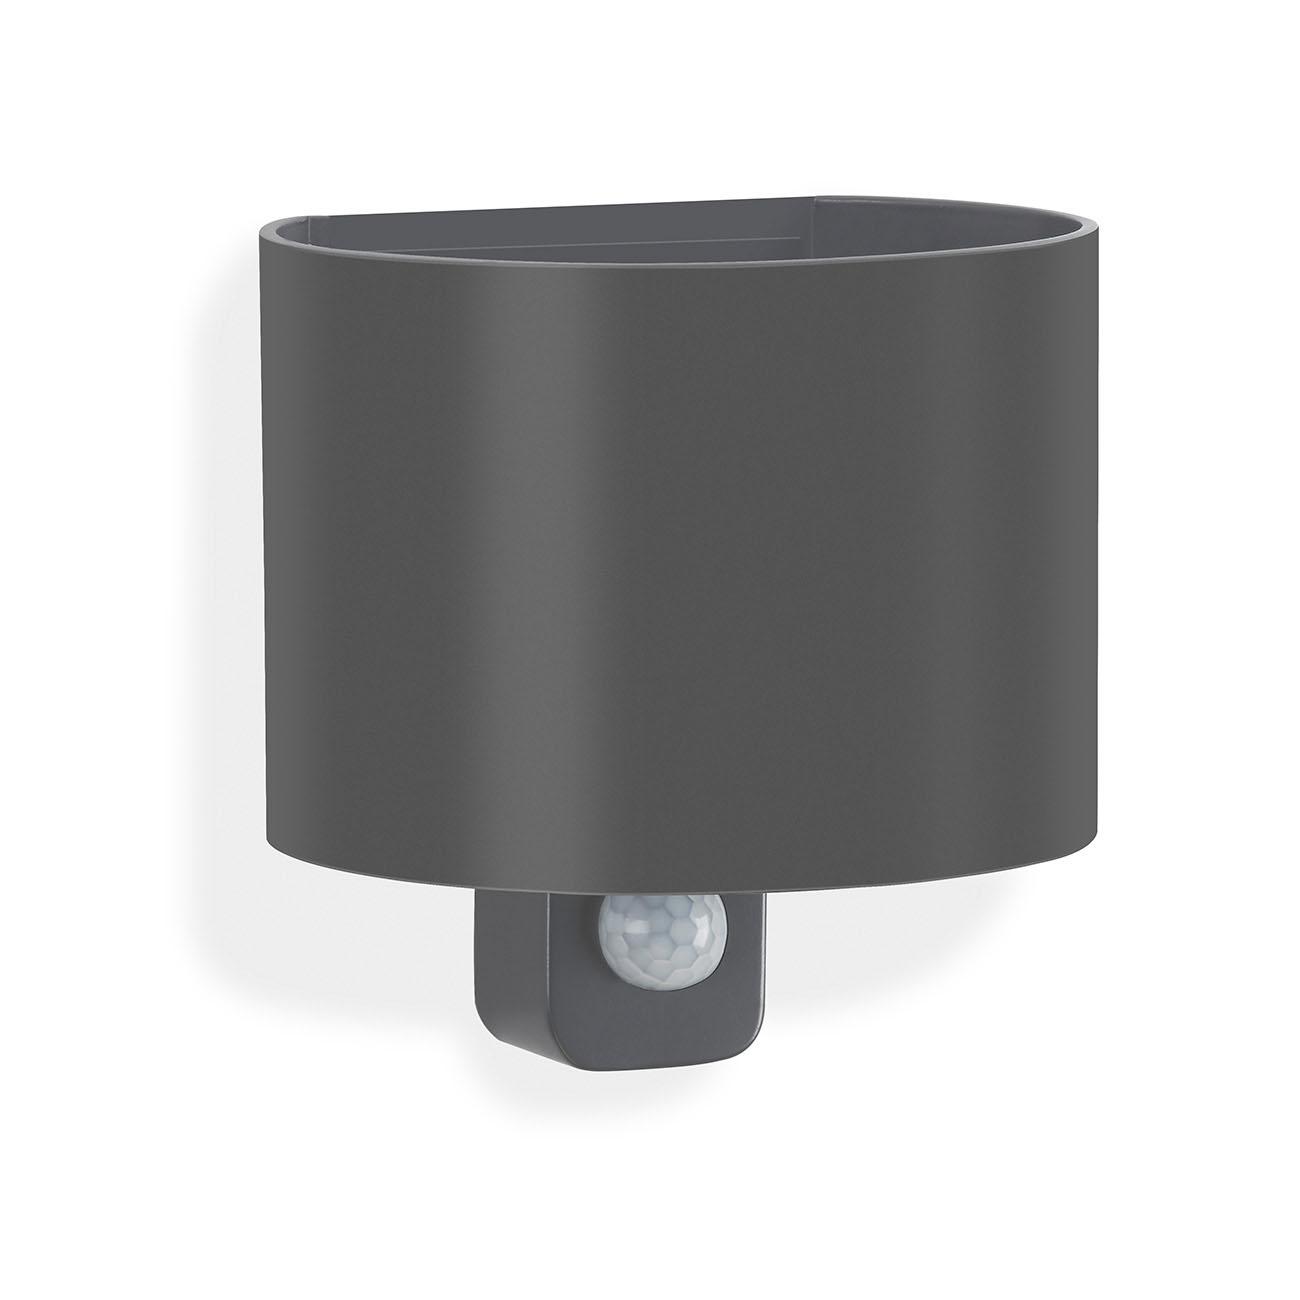 TELEFUNKEN Sensor LED Aussenleuchte, 14 cm, 7 W, Anthrazit